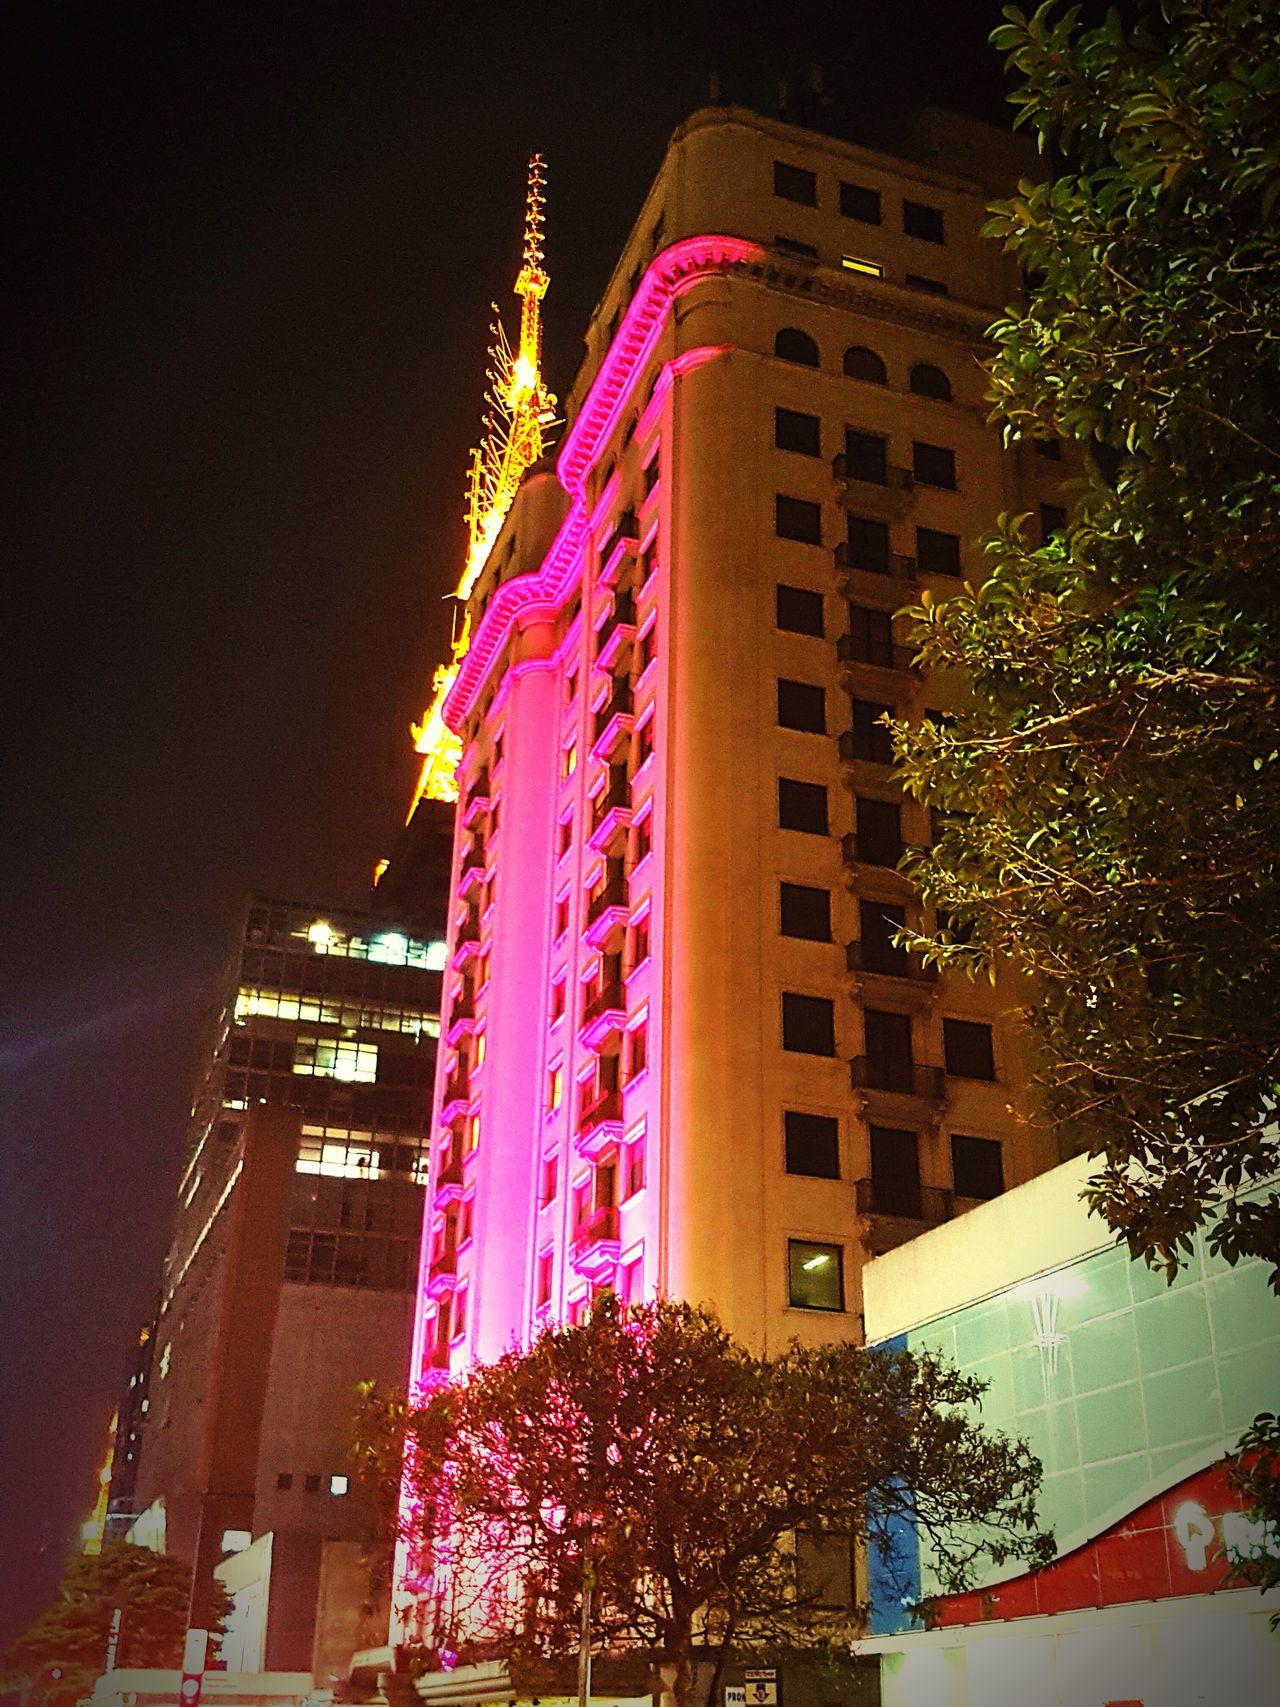 Outubro rosa contra o câncer de mama e vc já aderiu? Architecture Illuminated Night Built Structure Modern PinkOut Pinkpoctober Outubrorosa Outubrorosa💕 Outubrorosa💗🌷 Outubro October October Sweet October! Cancerdemama